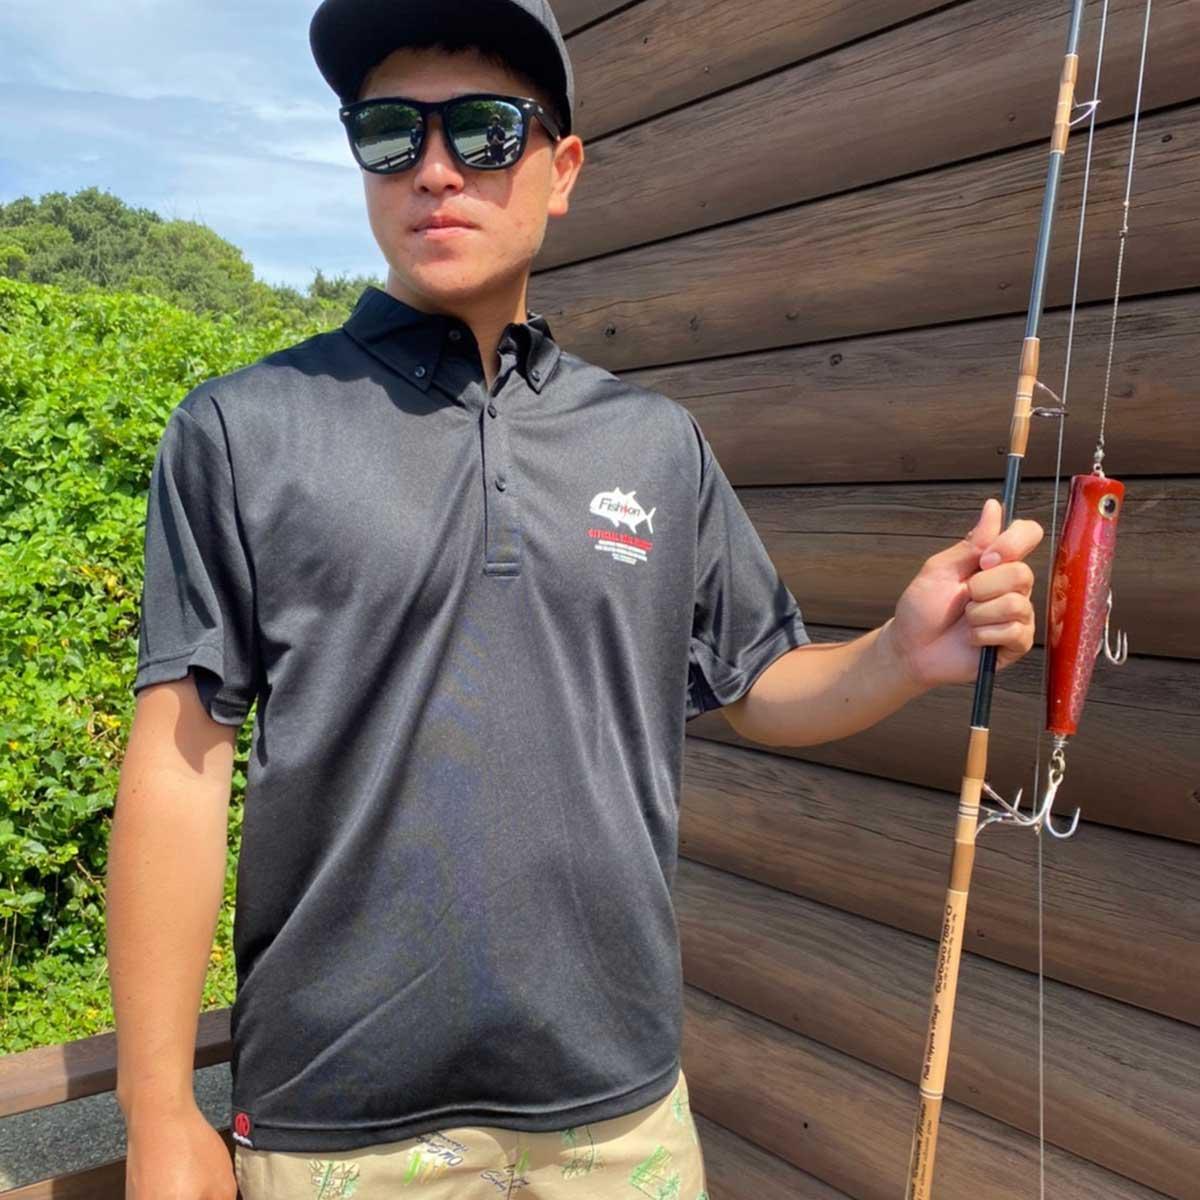 FISH HUNTER DRY POLO SHIRT